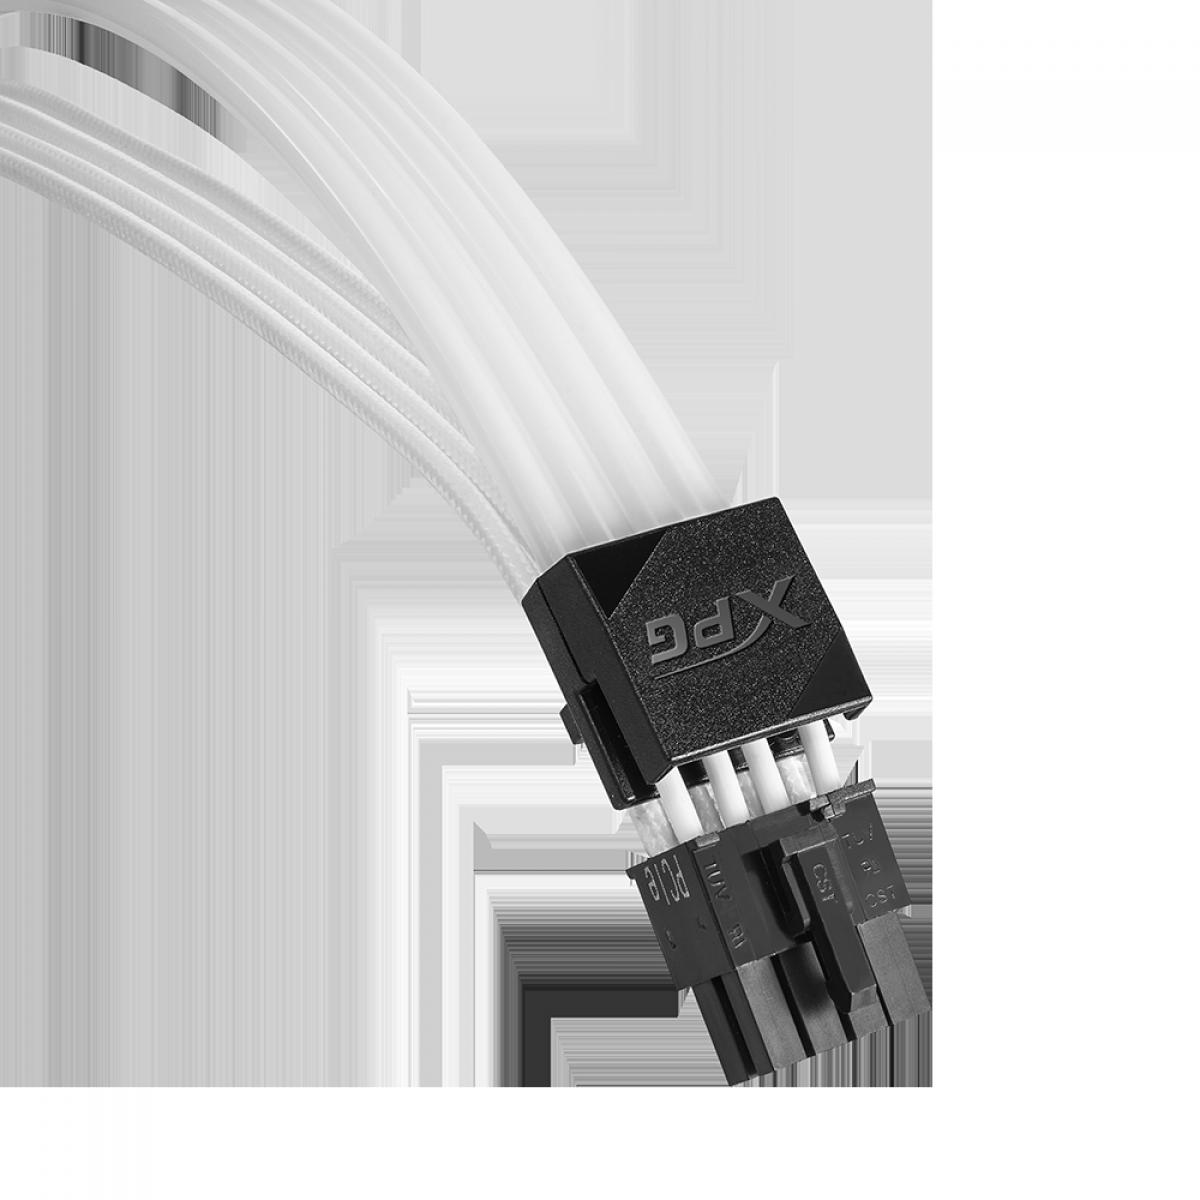 Cabo Extensor XPG Prime ARGB, VGA 8+8P, ARGBEXCABLE-VGA-BKCWW